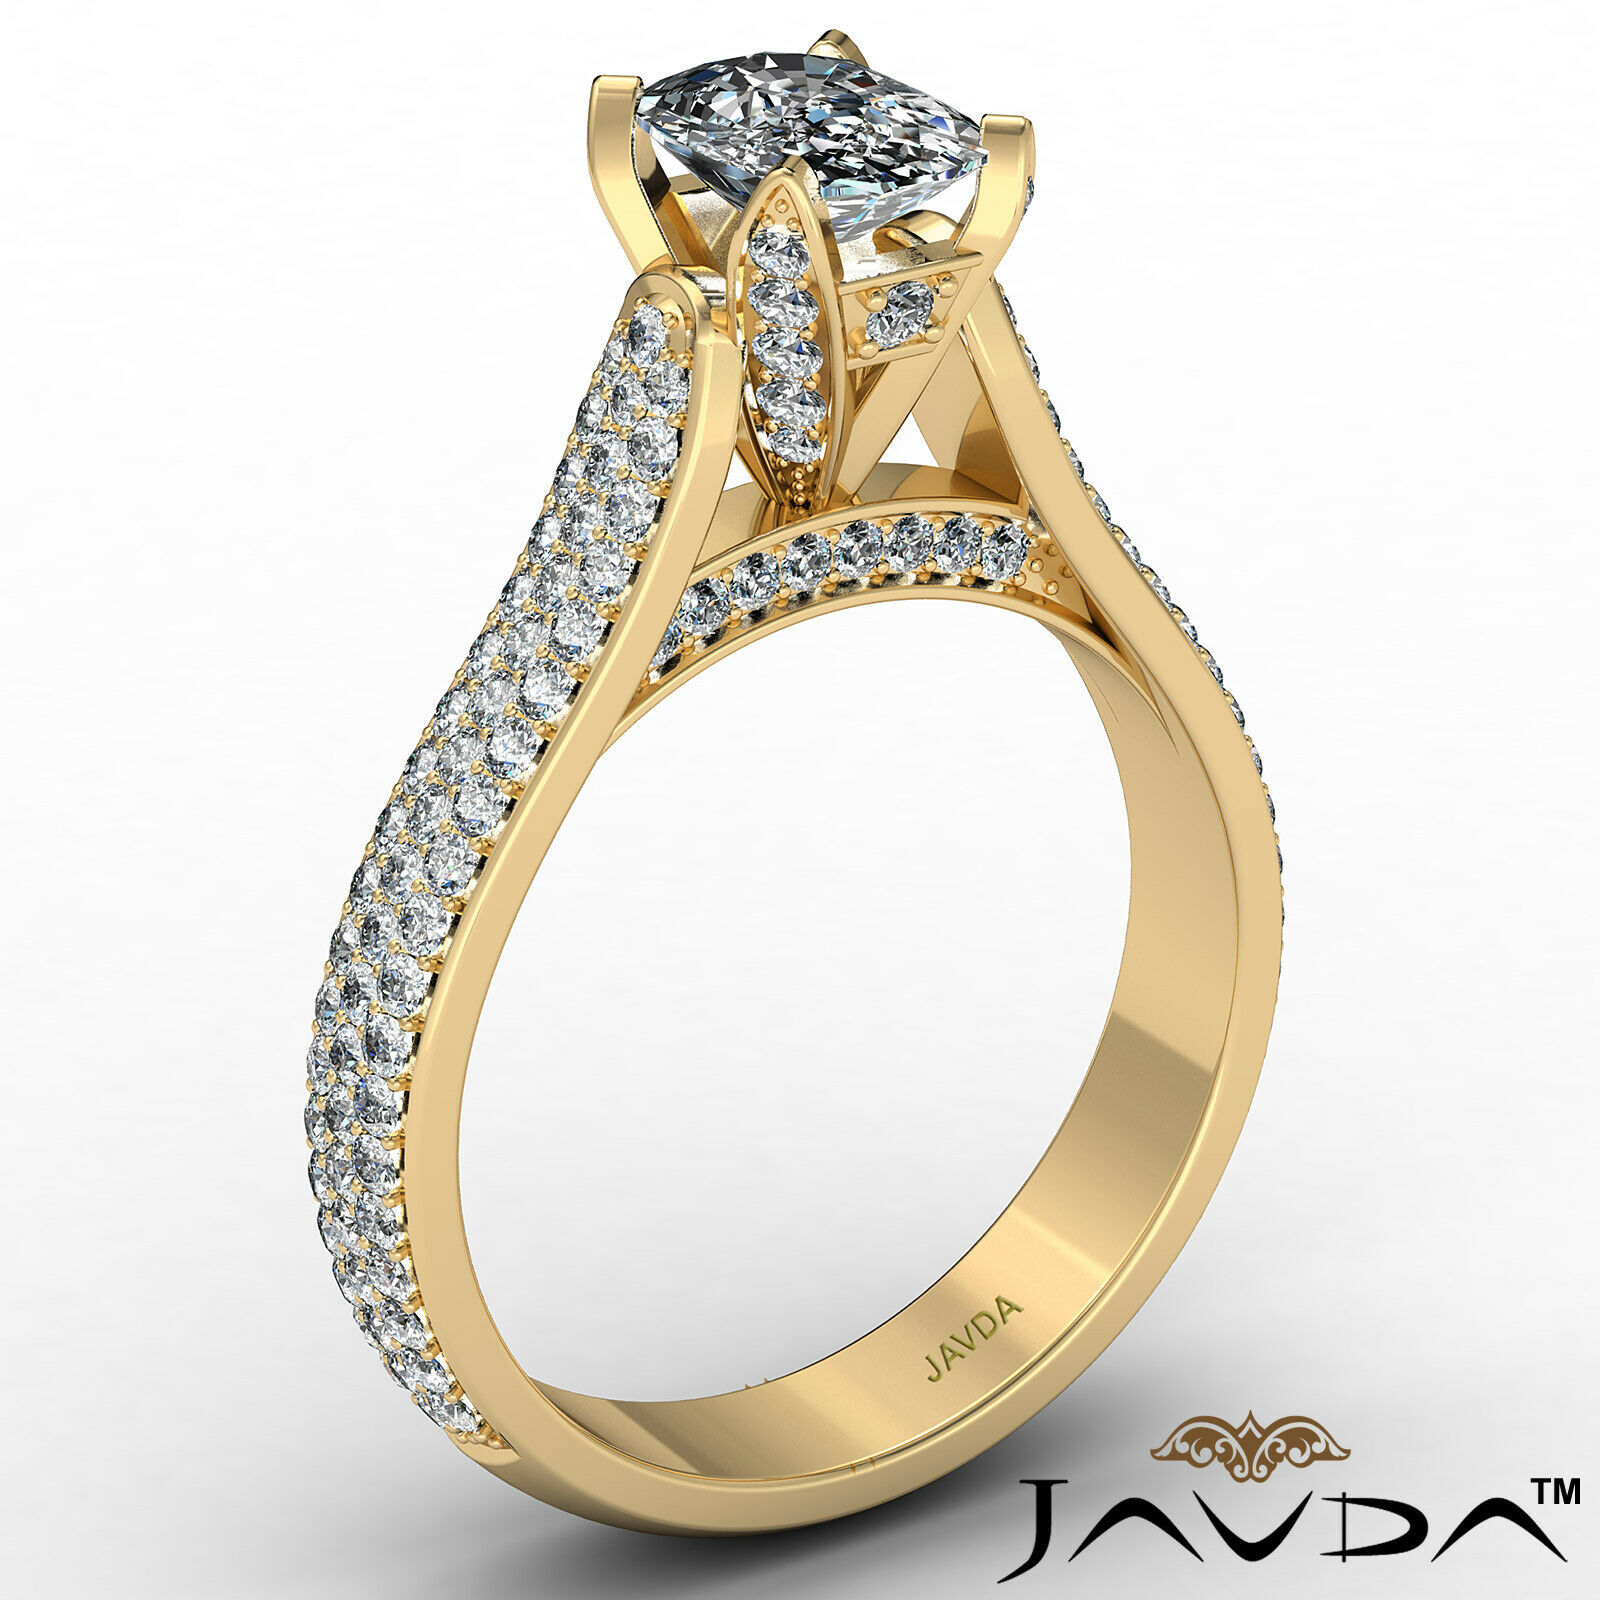 3 Row Shank Cushion Diamond Engagement Ring GIA E Color & SI1 clarity 2.35 ctw 4